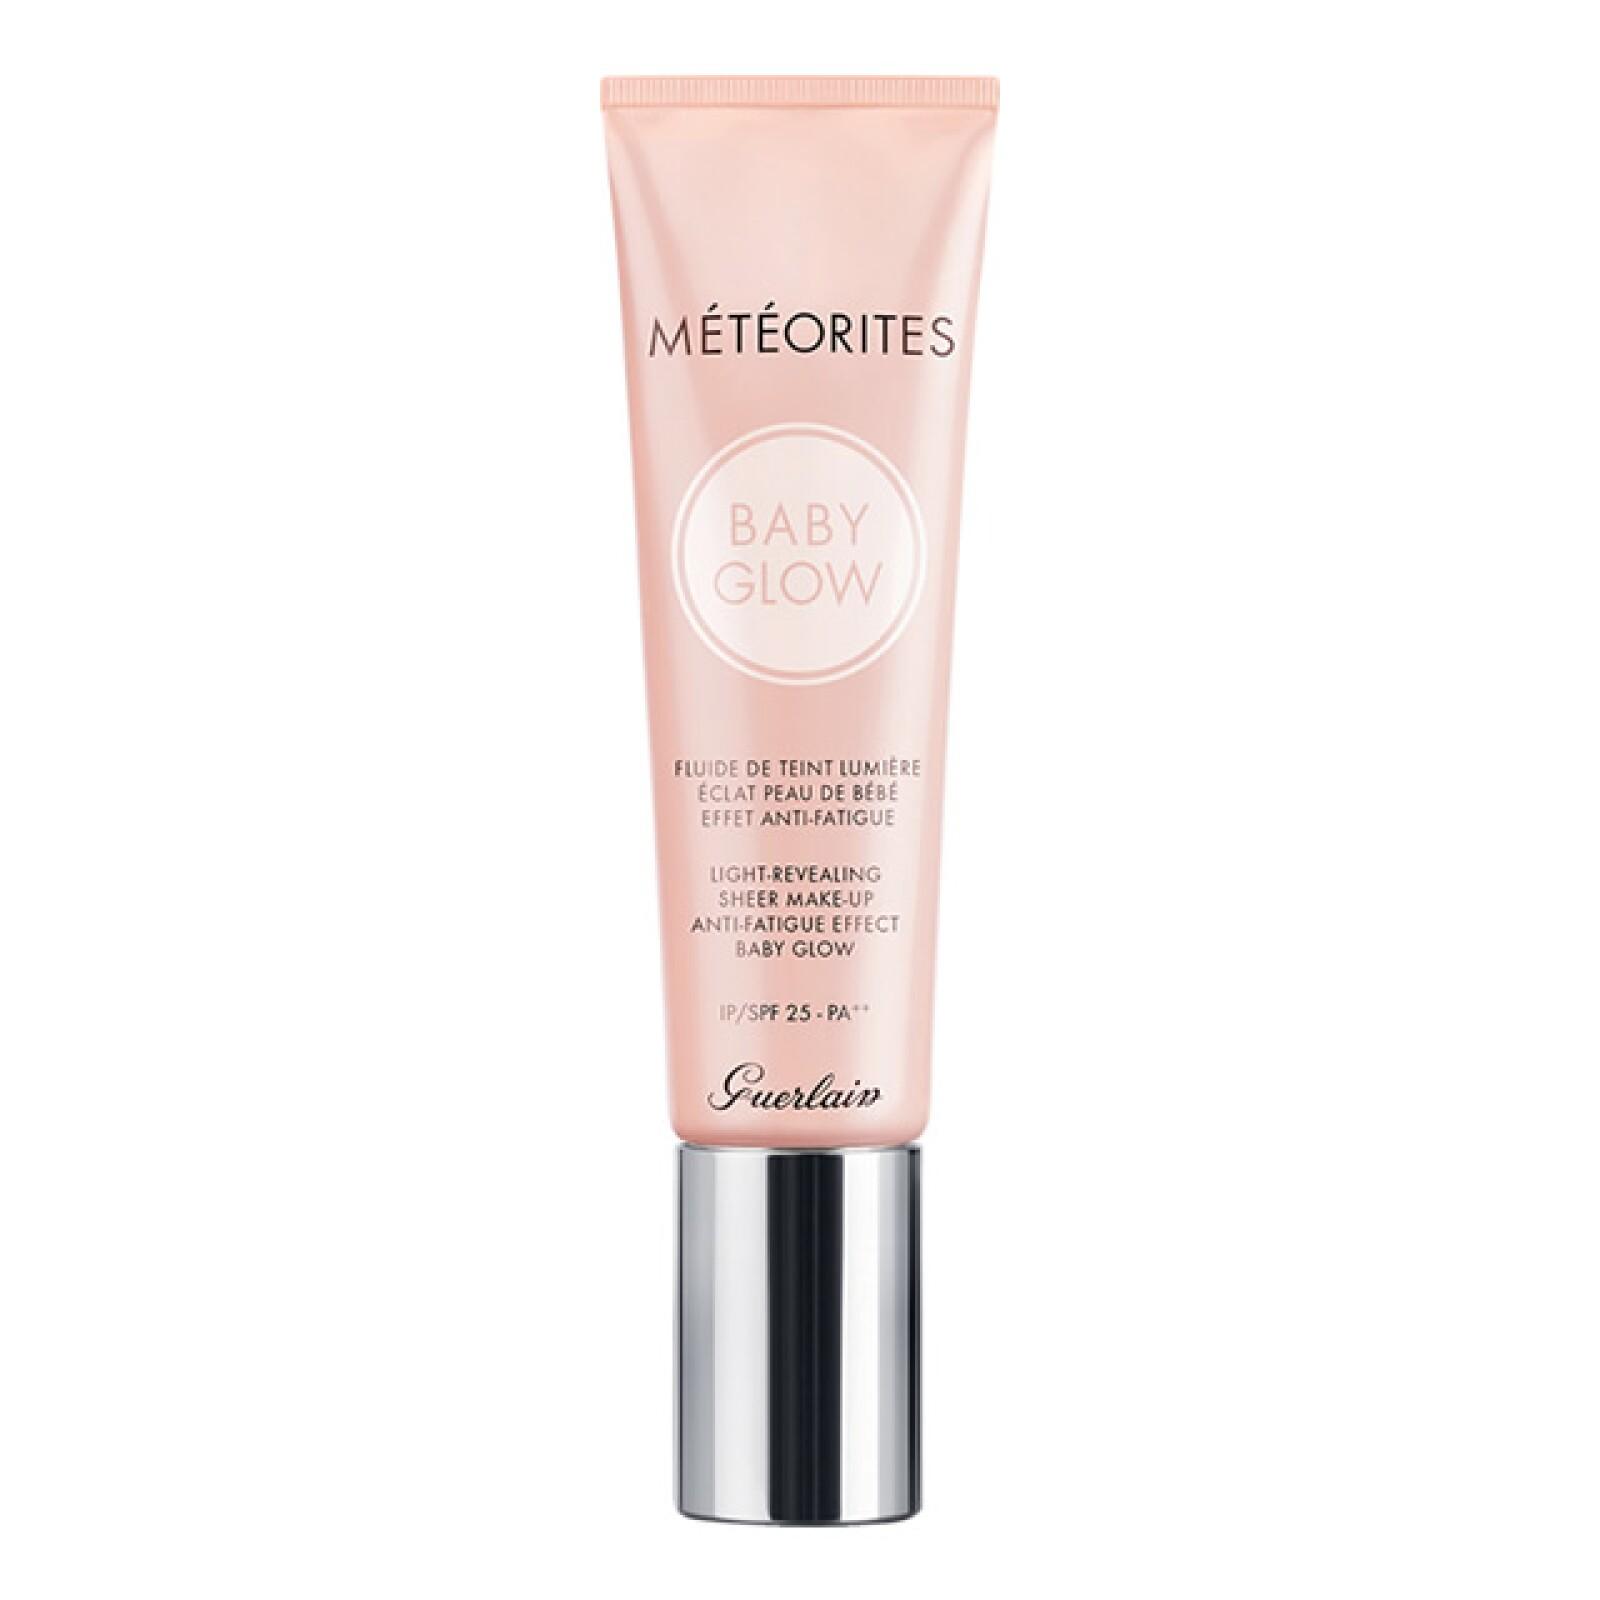 Guerlain: Météorites Light-Revealing Sheer Make-Up Anti-Fatigue Effect. El Palacio de Hierro Perisur. 810 pesos.